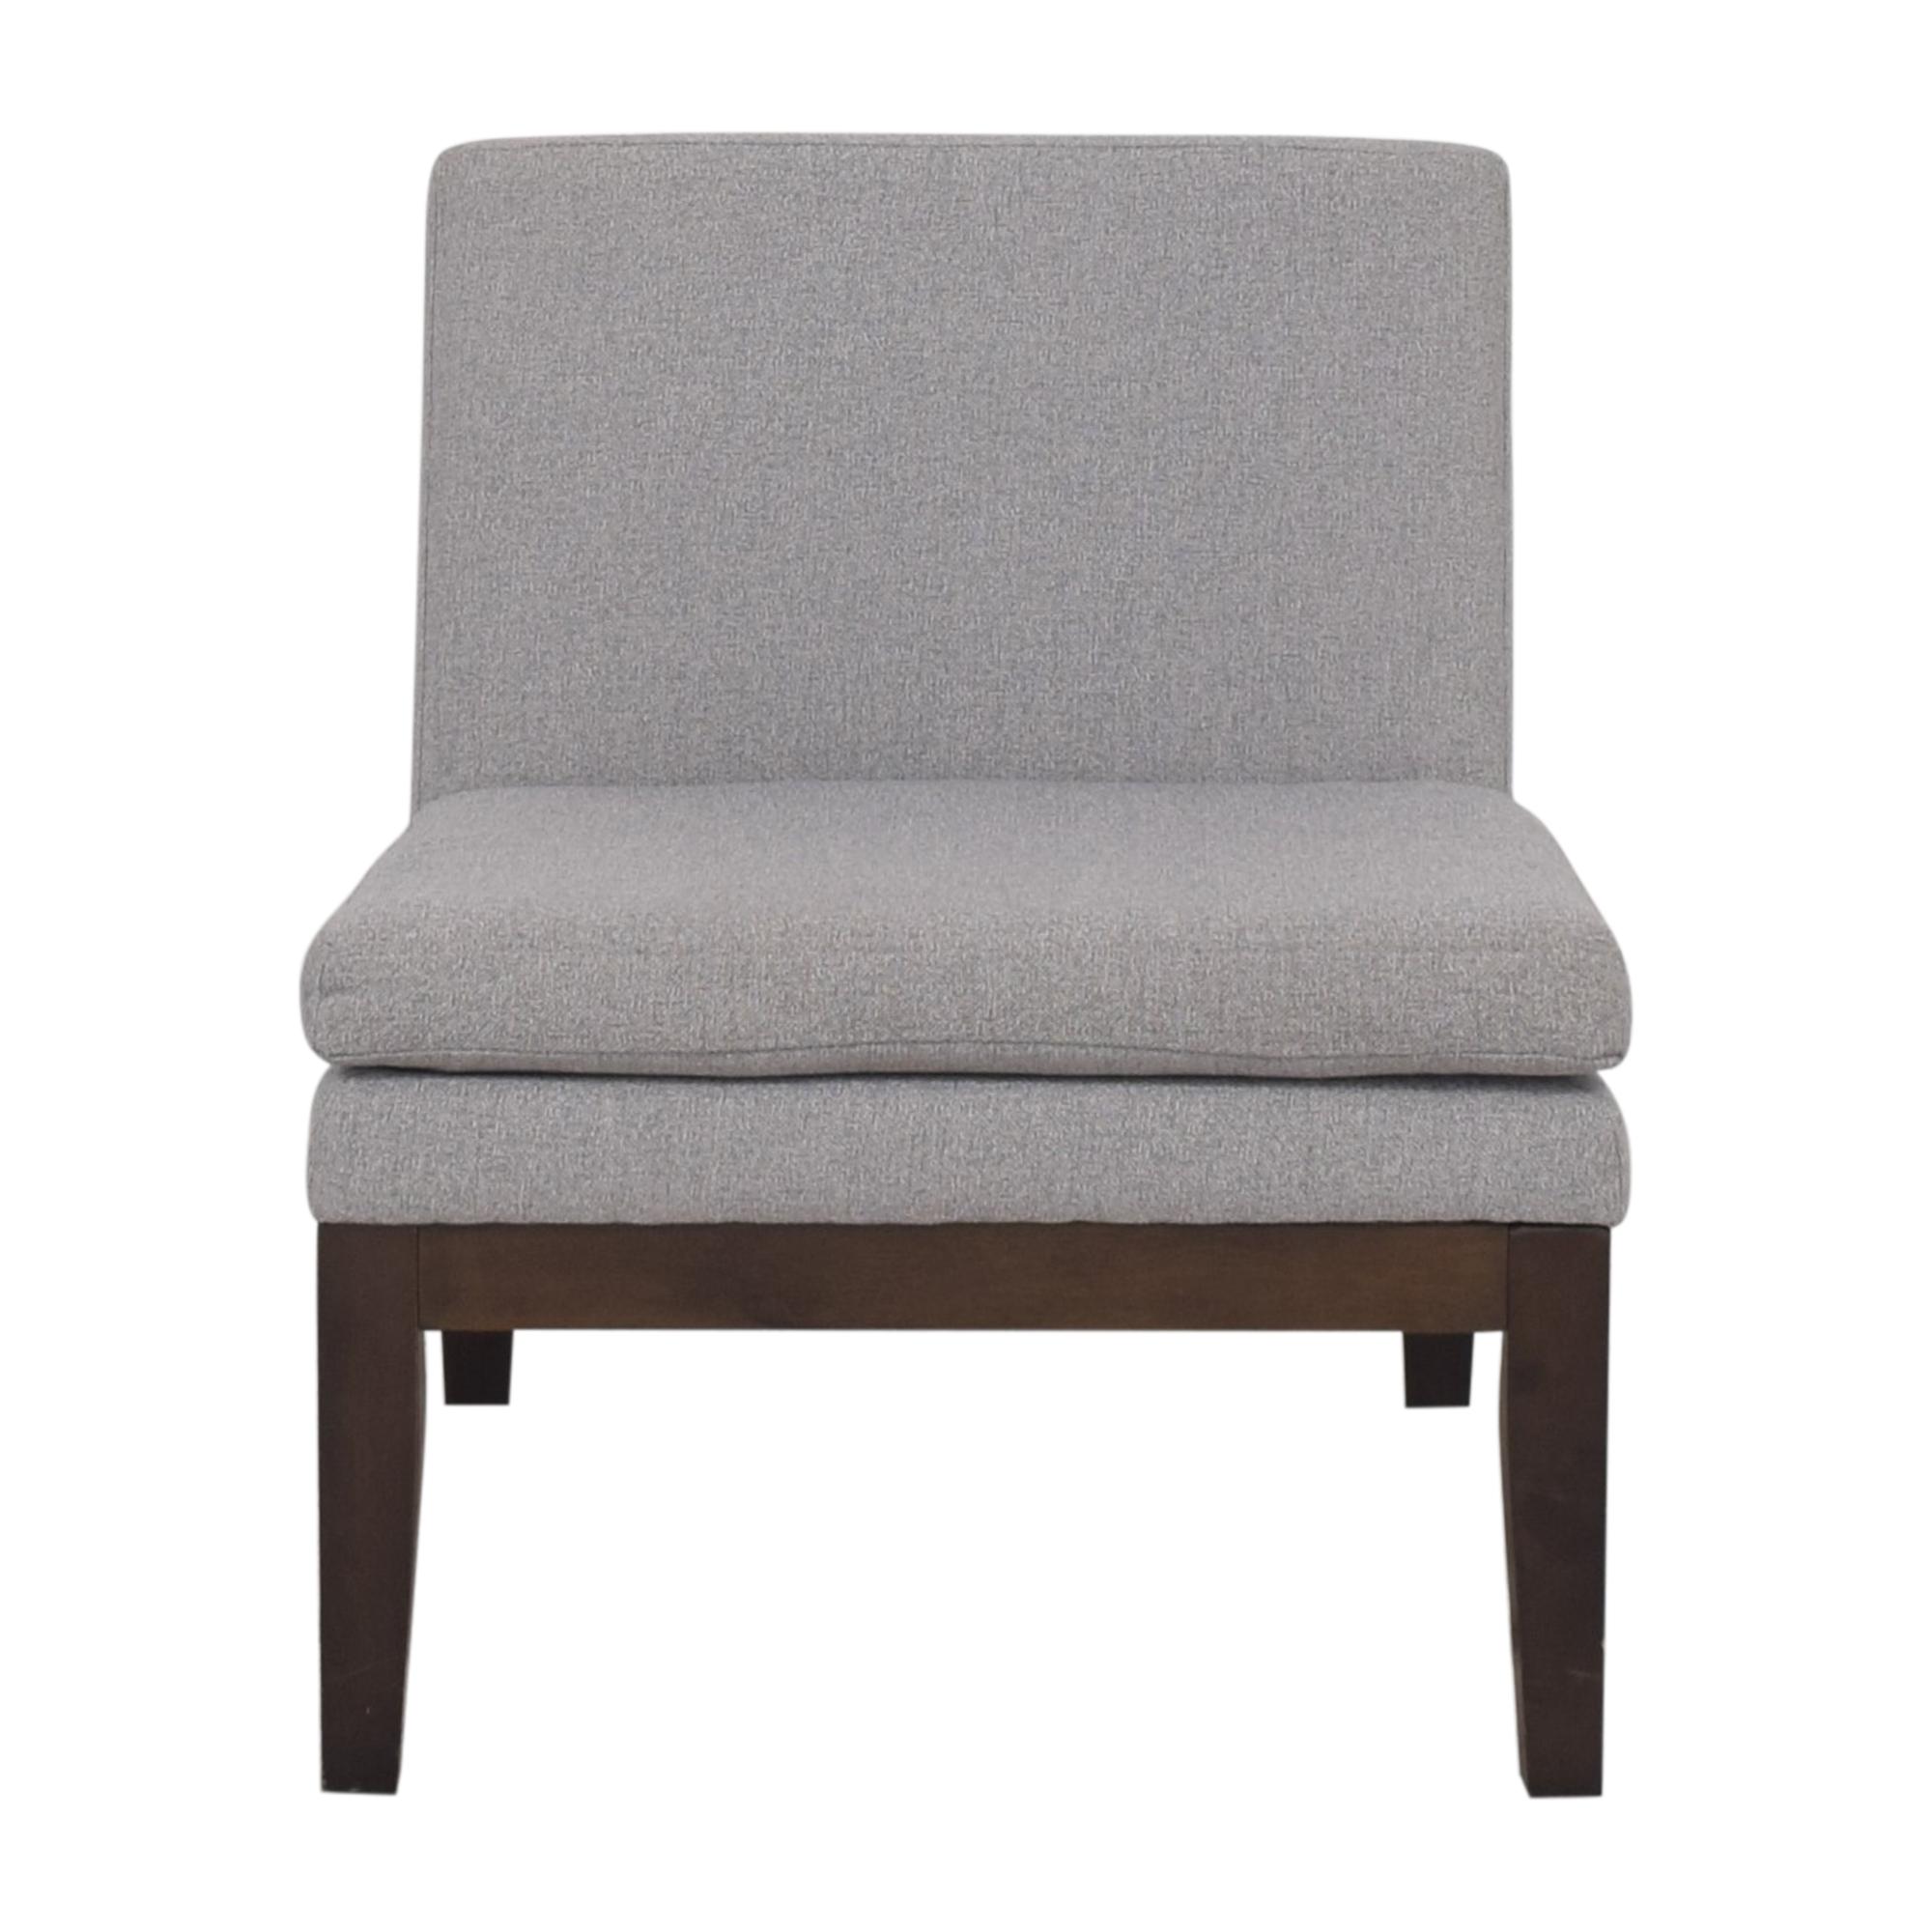 West Elm West Elm Slipper Chair nyc